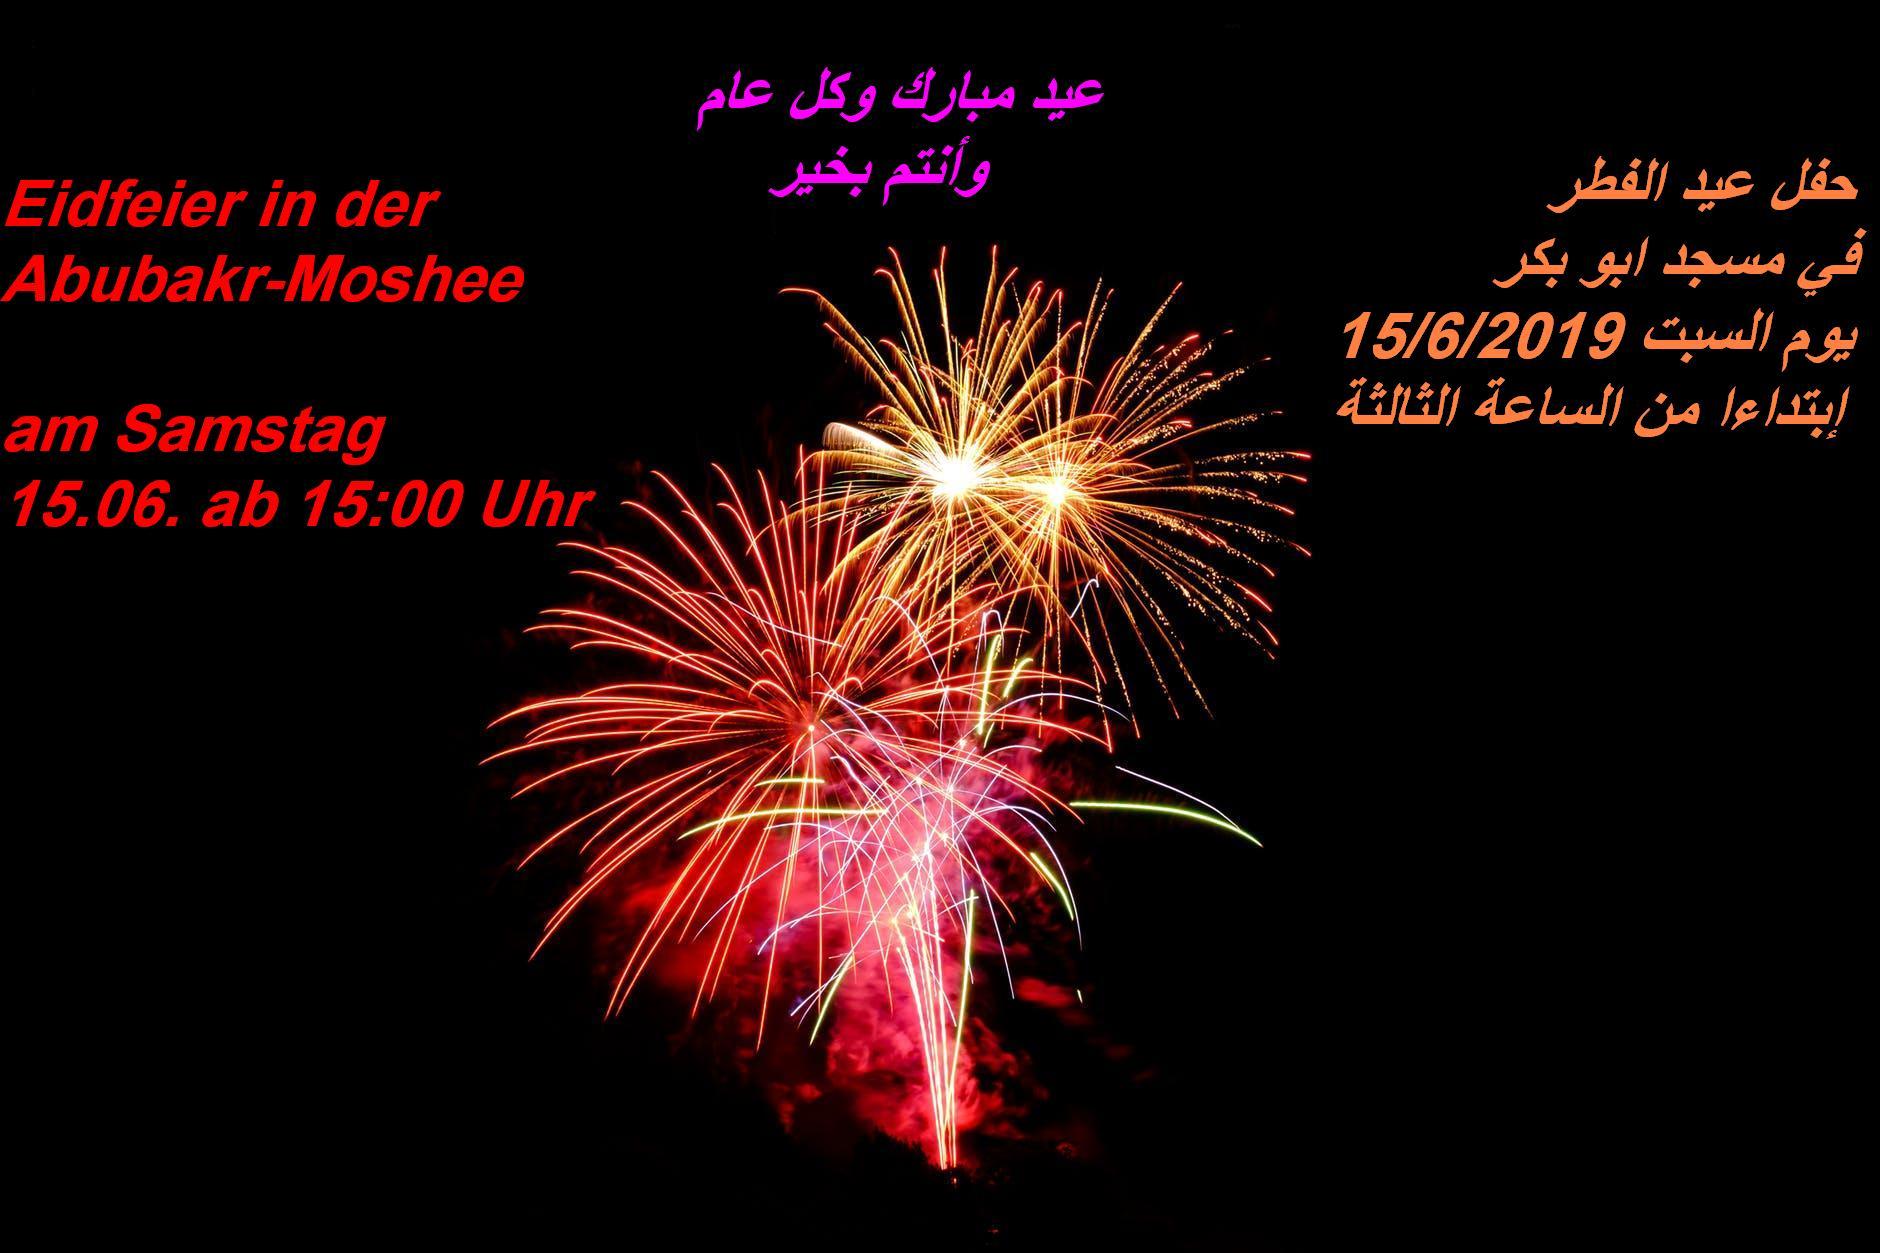 Eid-Feier حفل العيد